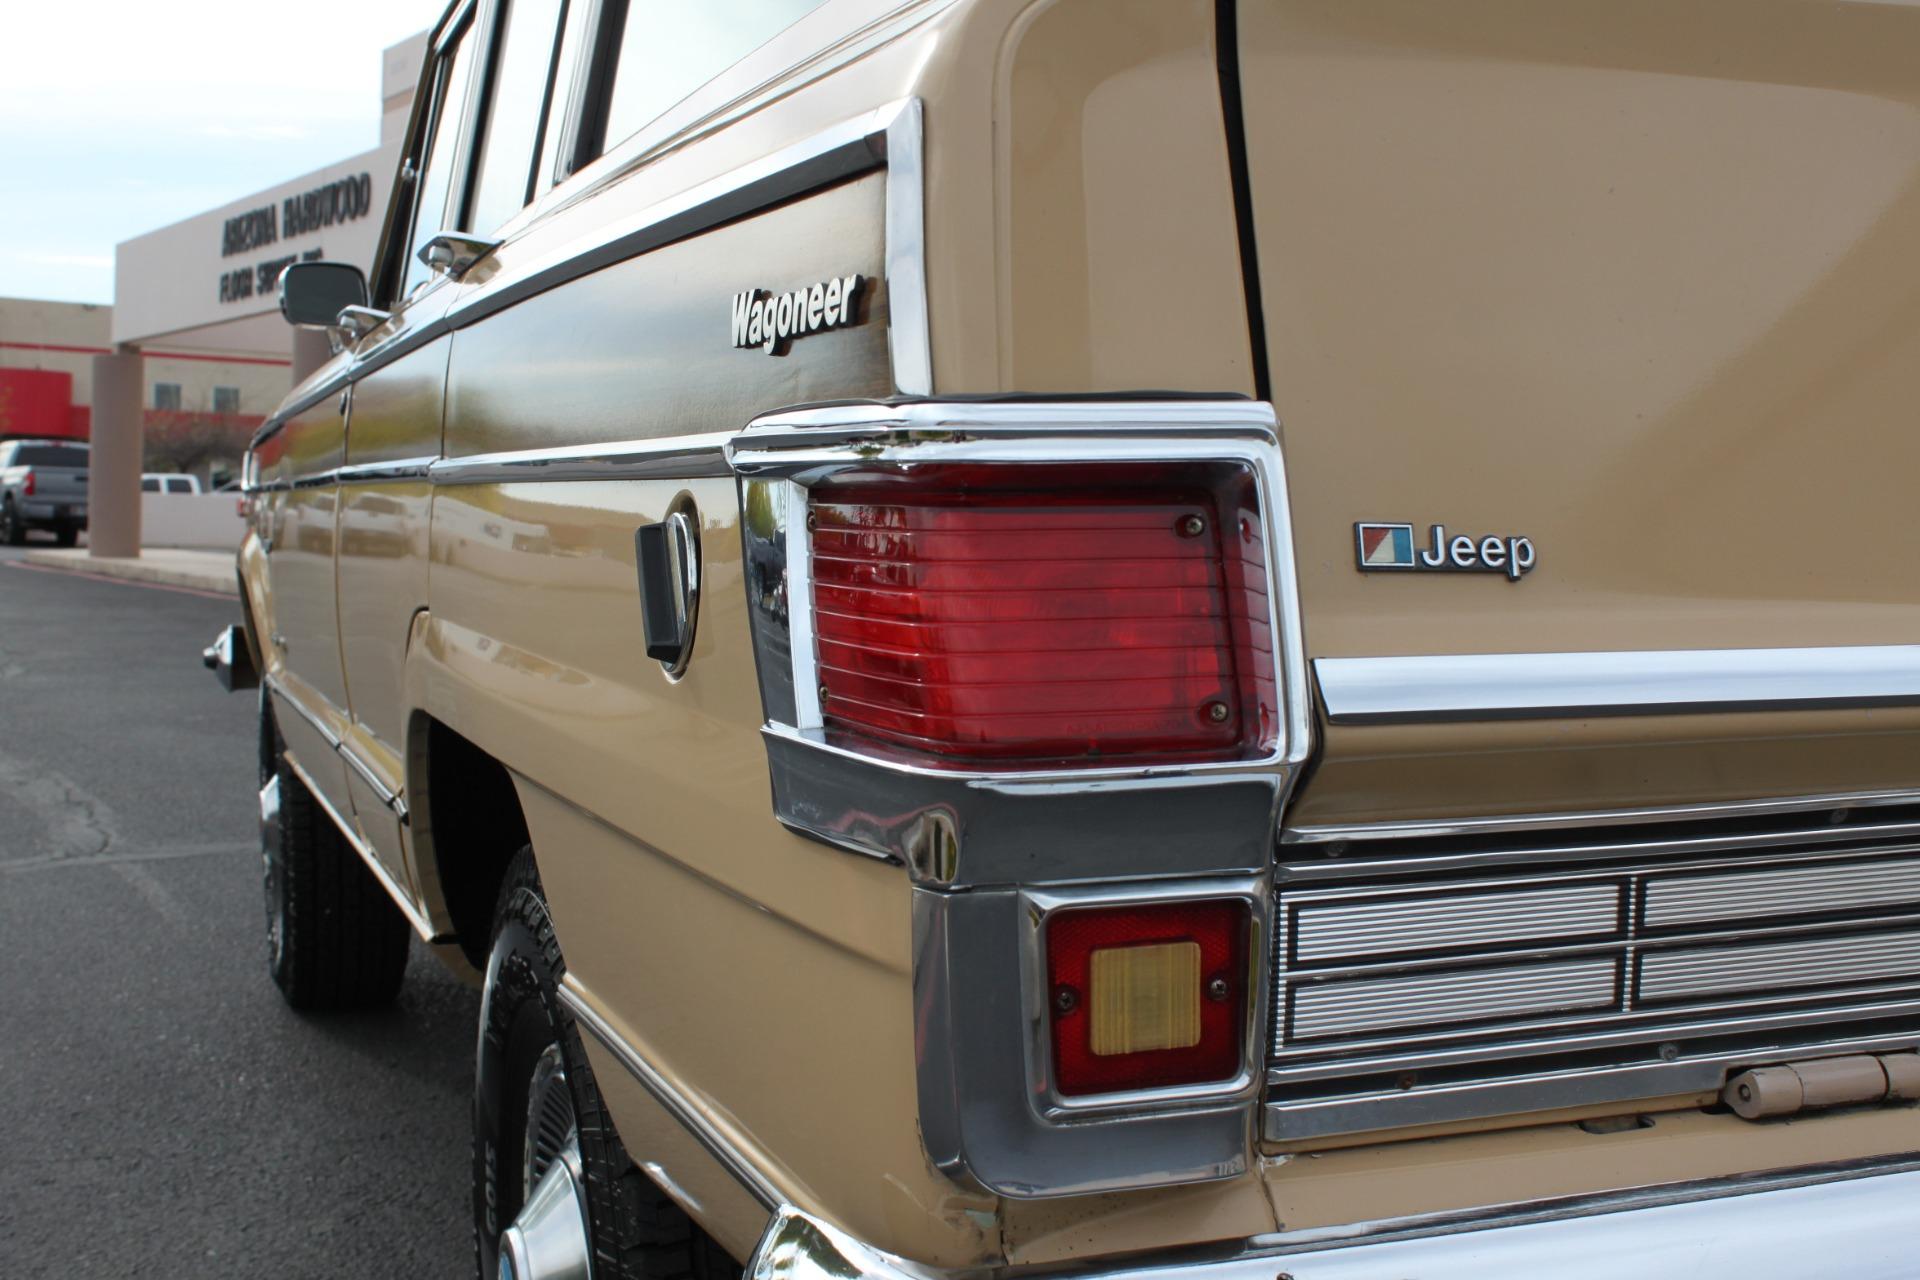 Used-1977-Jeep-Wagoneer-Brougham-Honda